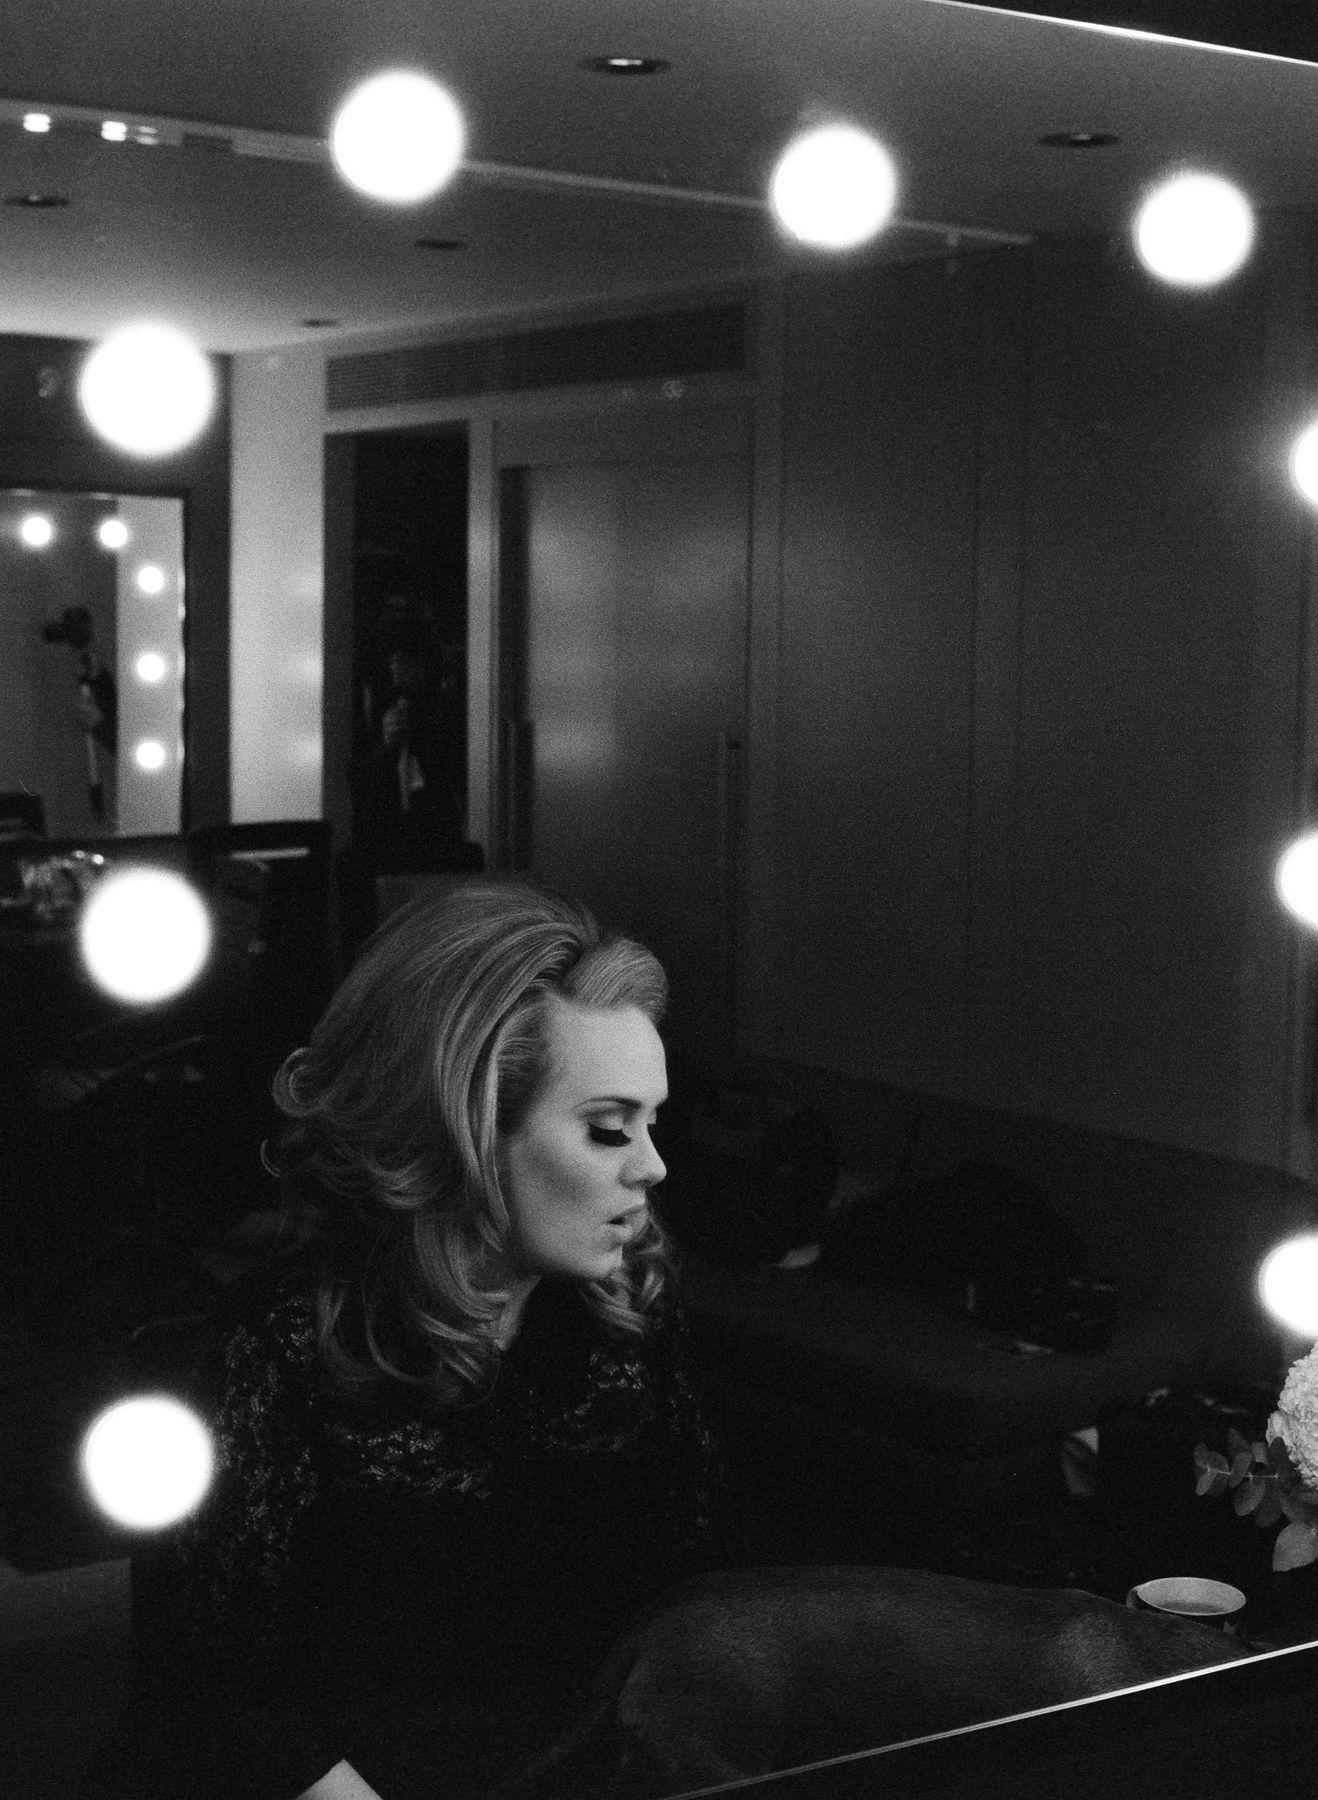 Adele Portrait By American Photographer Lauren Dukoff Adele